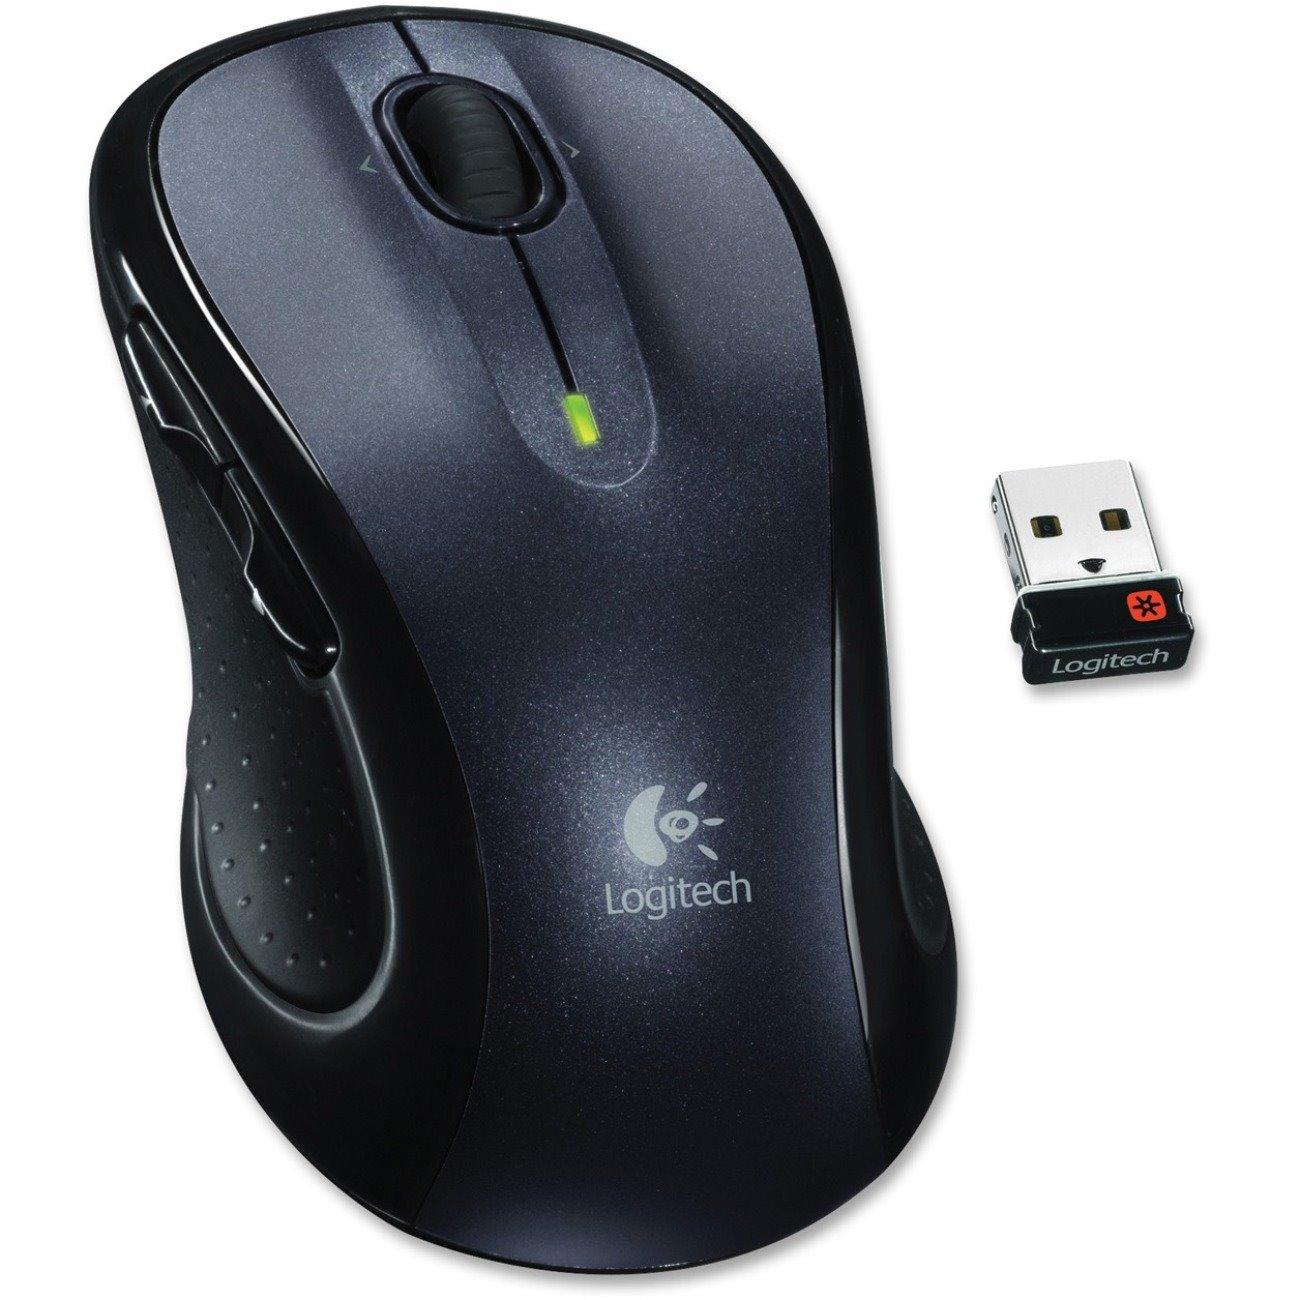 Logitech M510 Mouse - Laser - Wireless - Grey